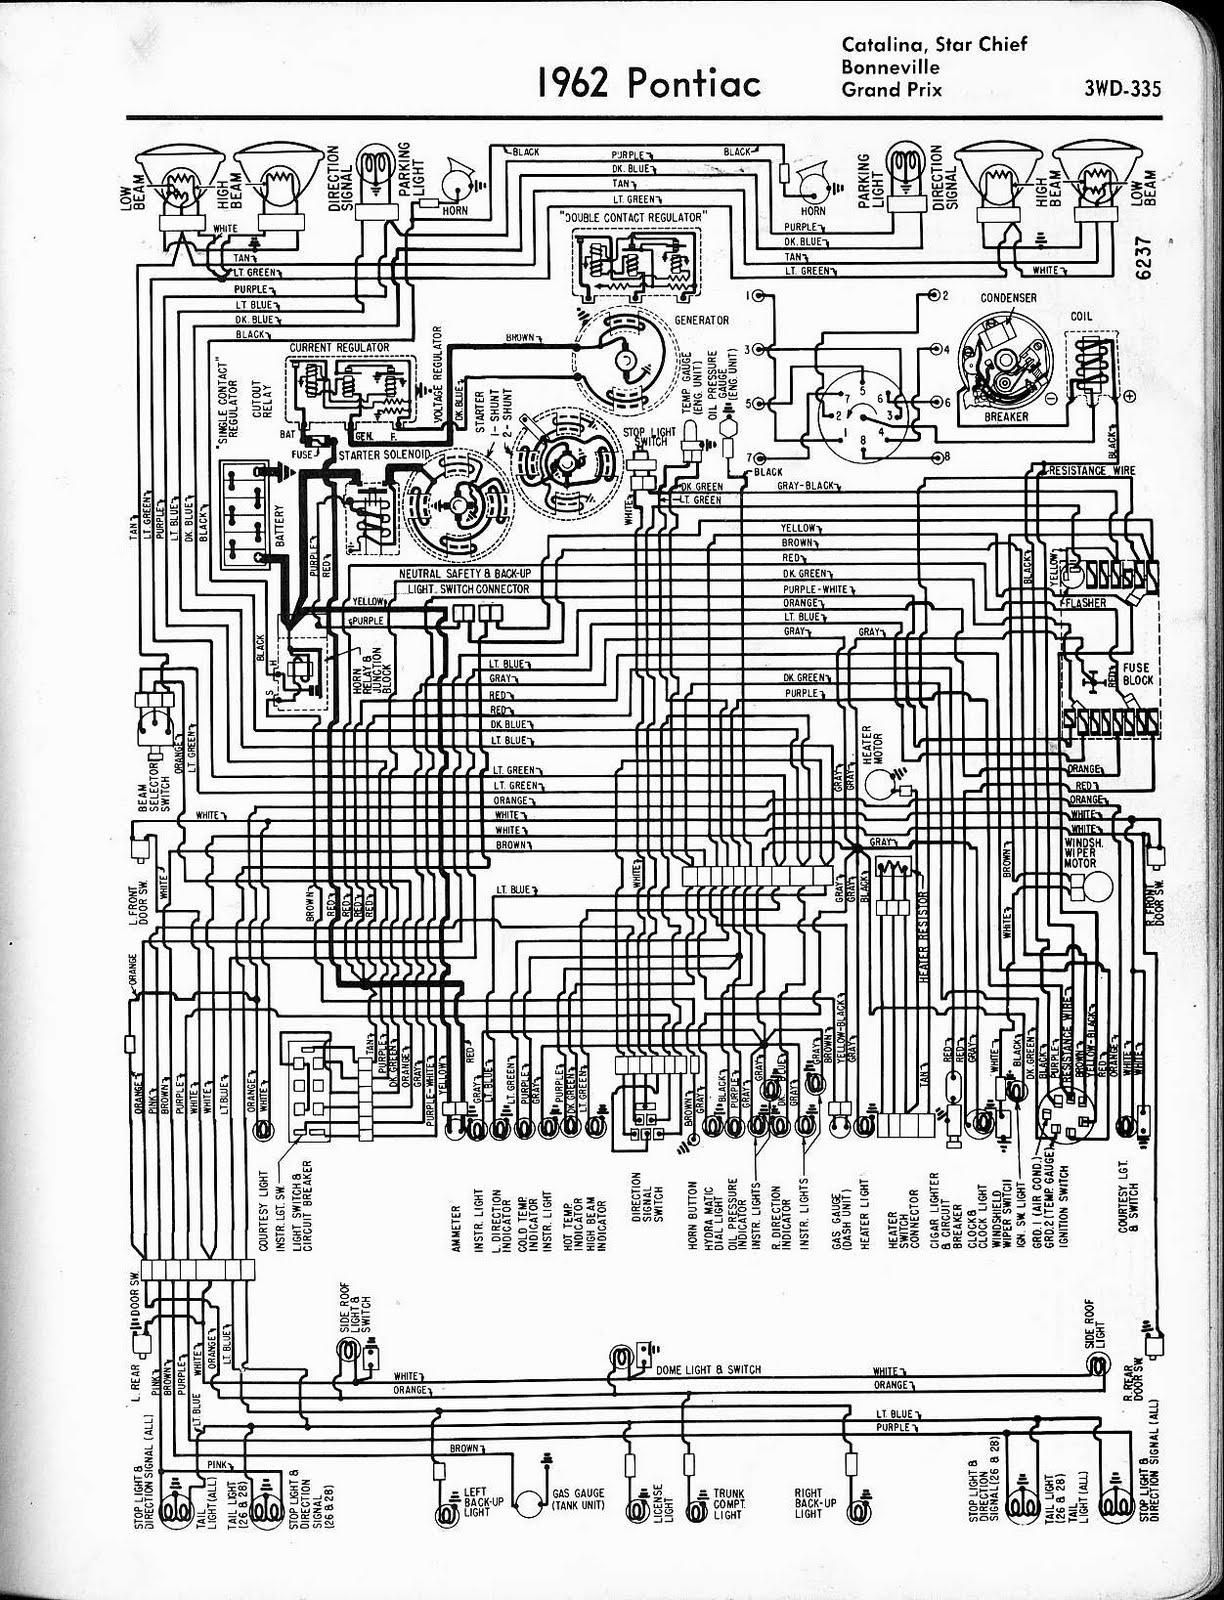 Amazing 76 Chevy Truck Wiring Diagram Photos - Wiring Diagram Ideas ...